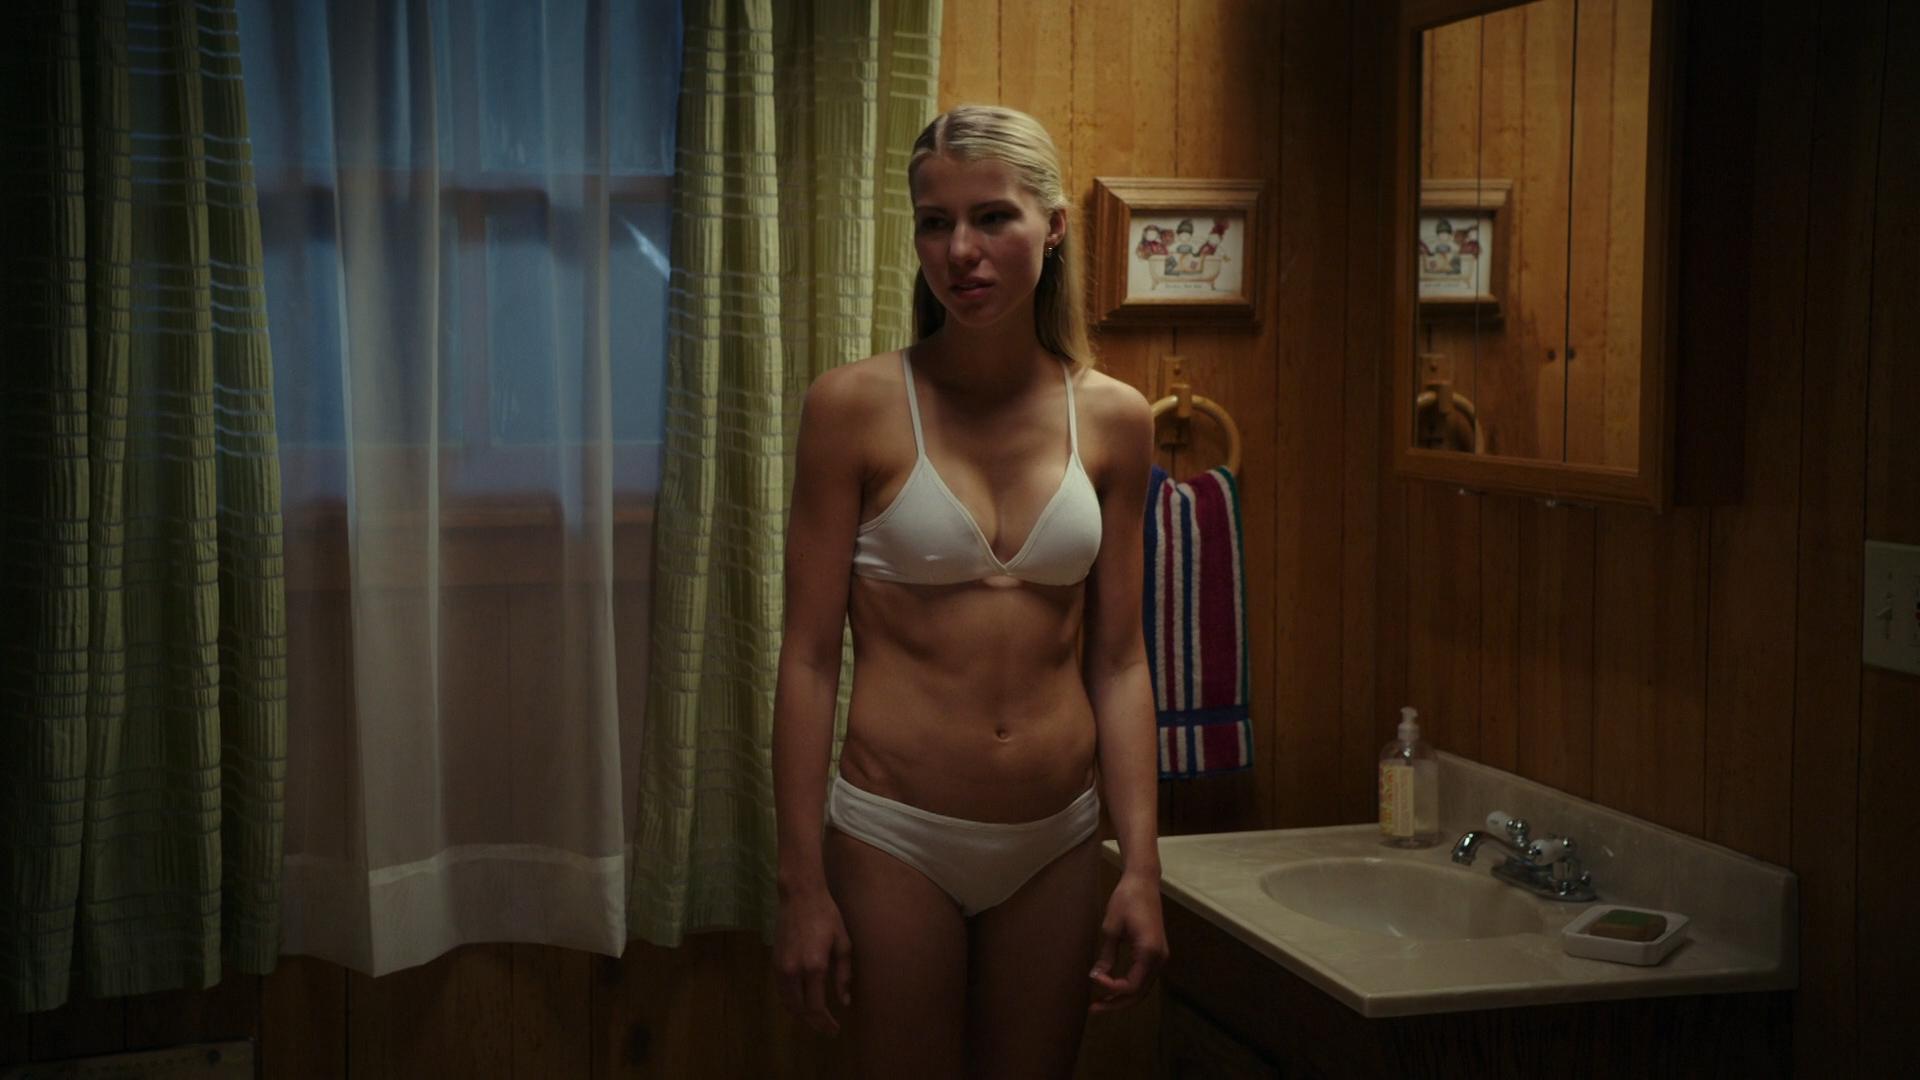 Cortney Palm nude topless and Lexi Atkins not nude but hot in bikini - Zombeavers (2014) hd1080p